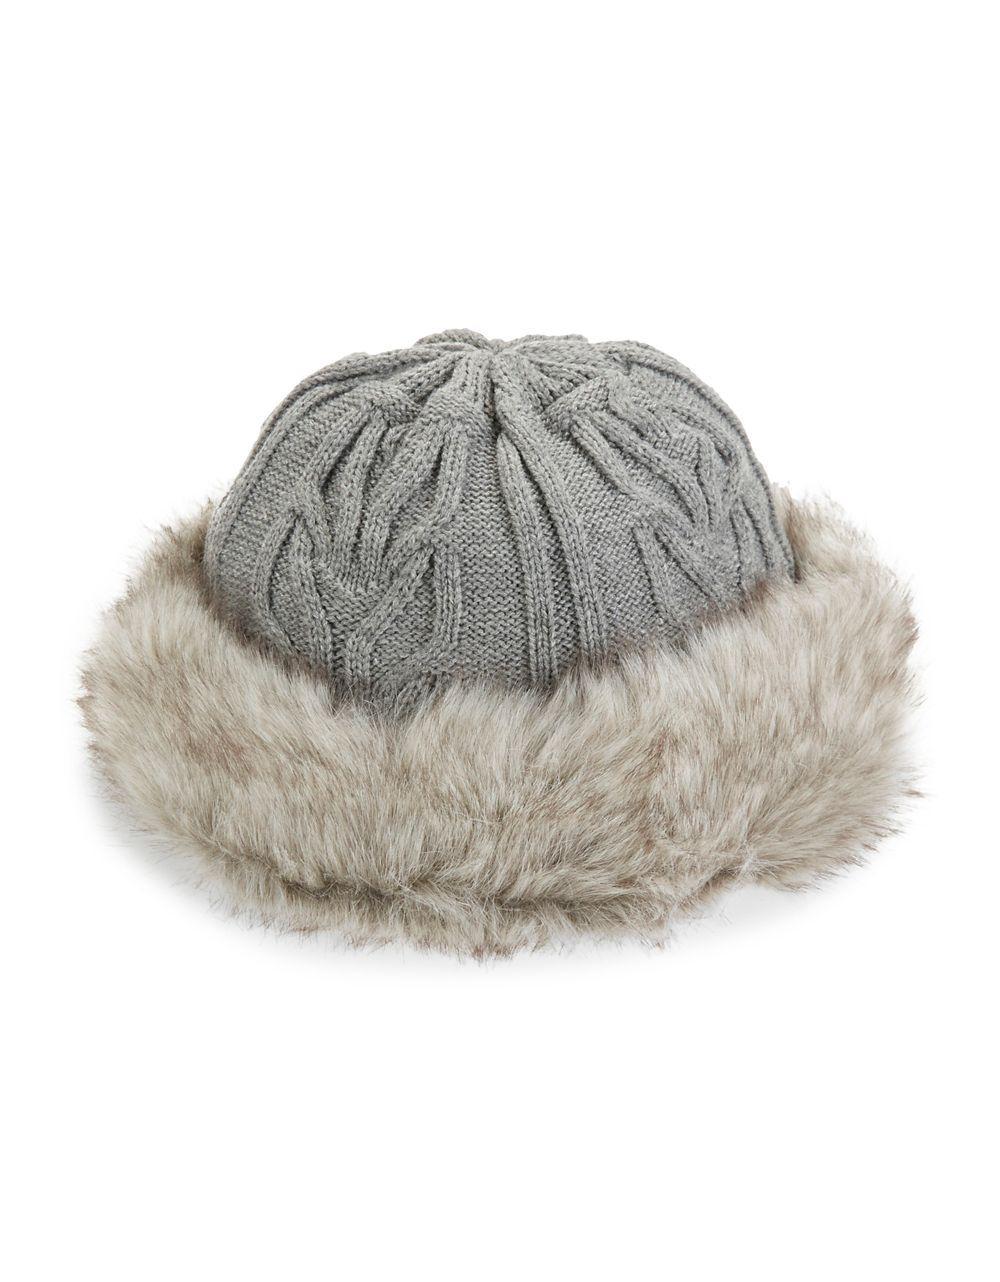 b49a09881 Parkhurst Gray Textured Faux Fur-trimmed Hat